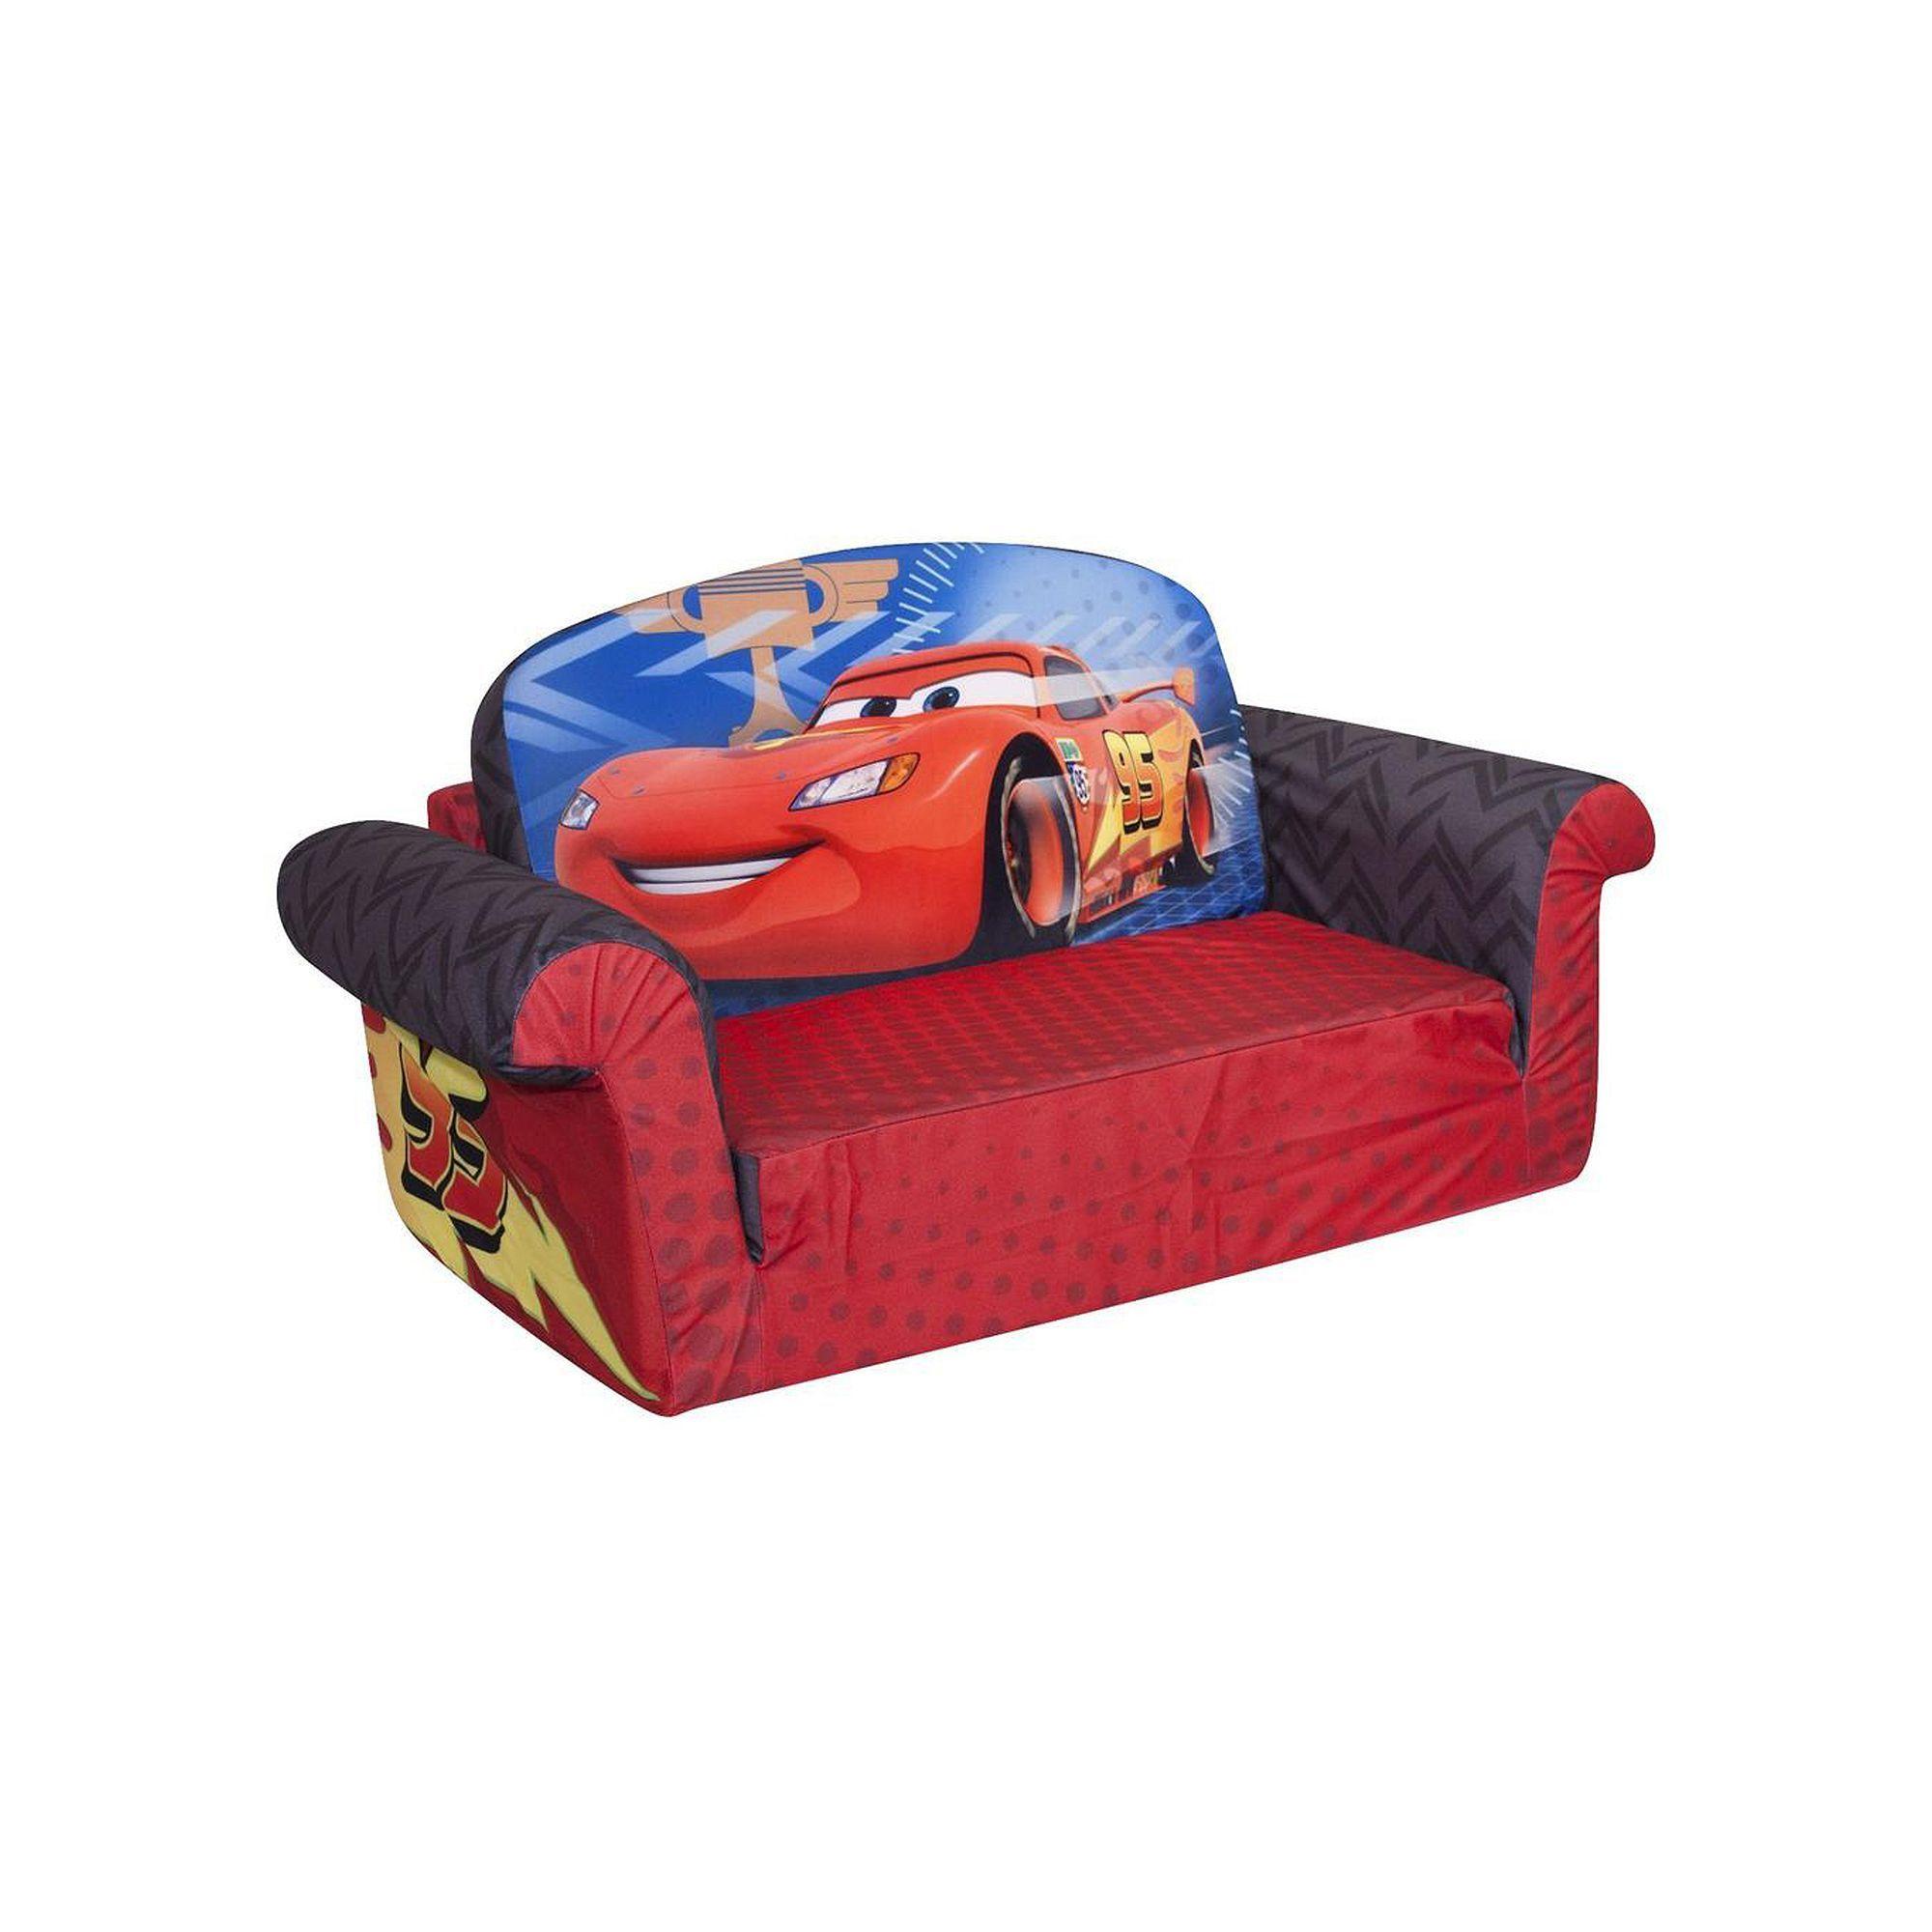 Disney Pixar Cars Marshmallow 2 In 1 Flip Open Kids Sofa By Spin